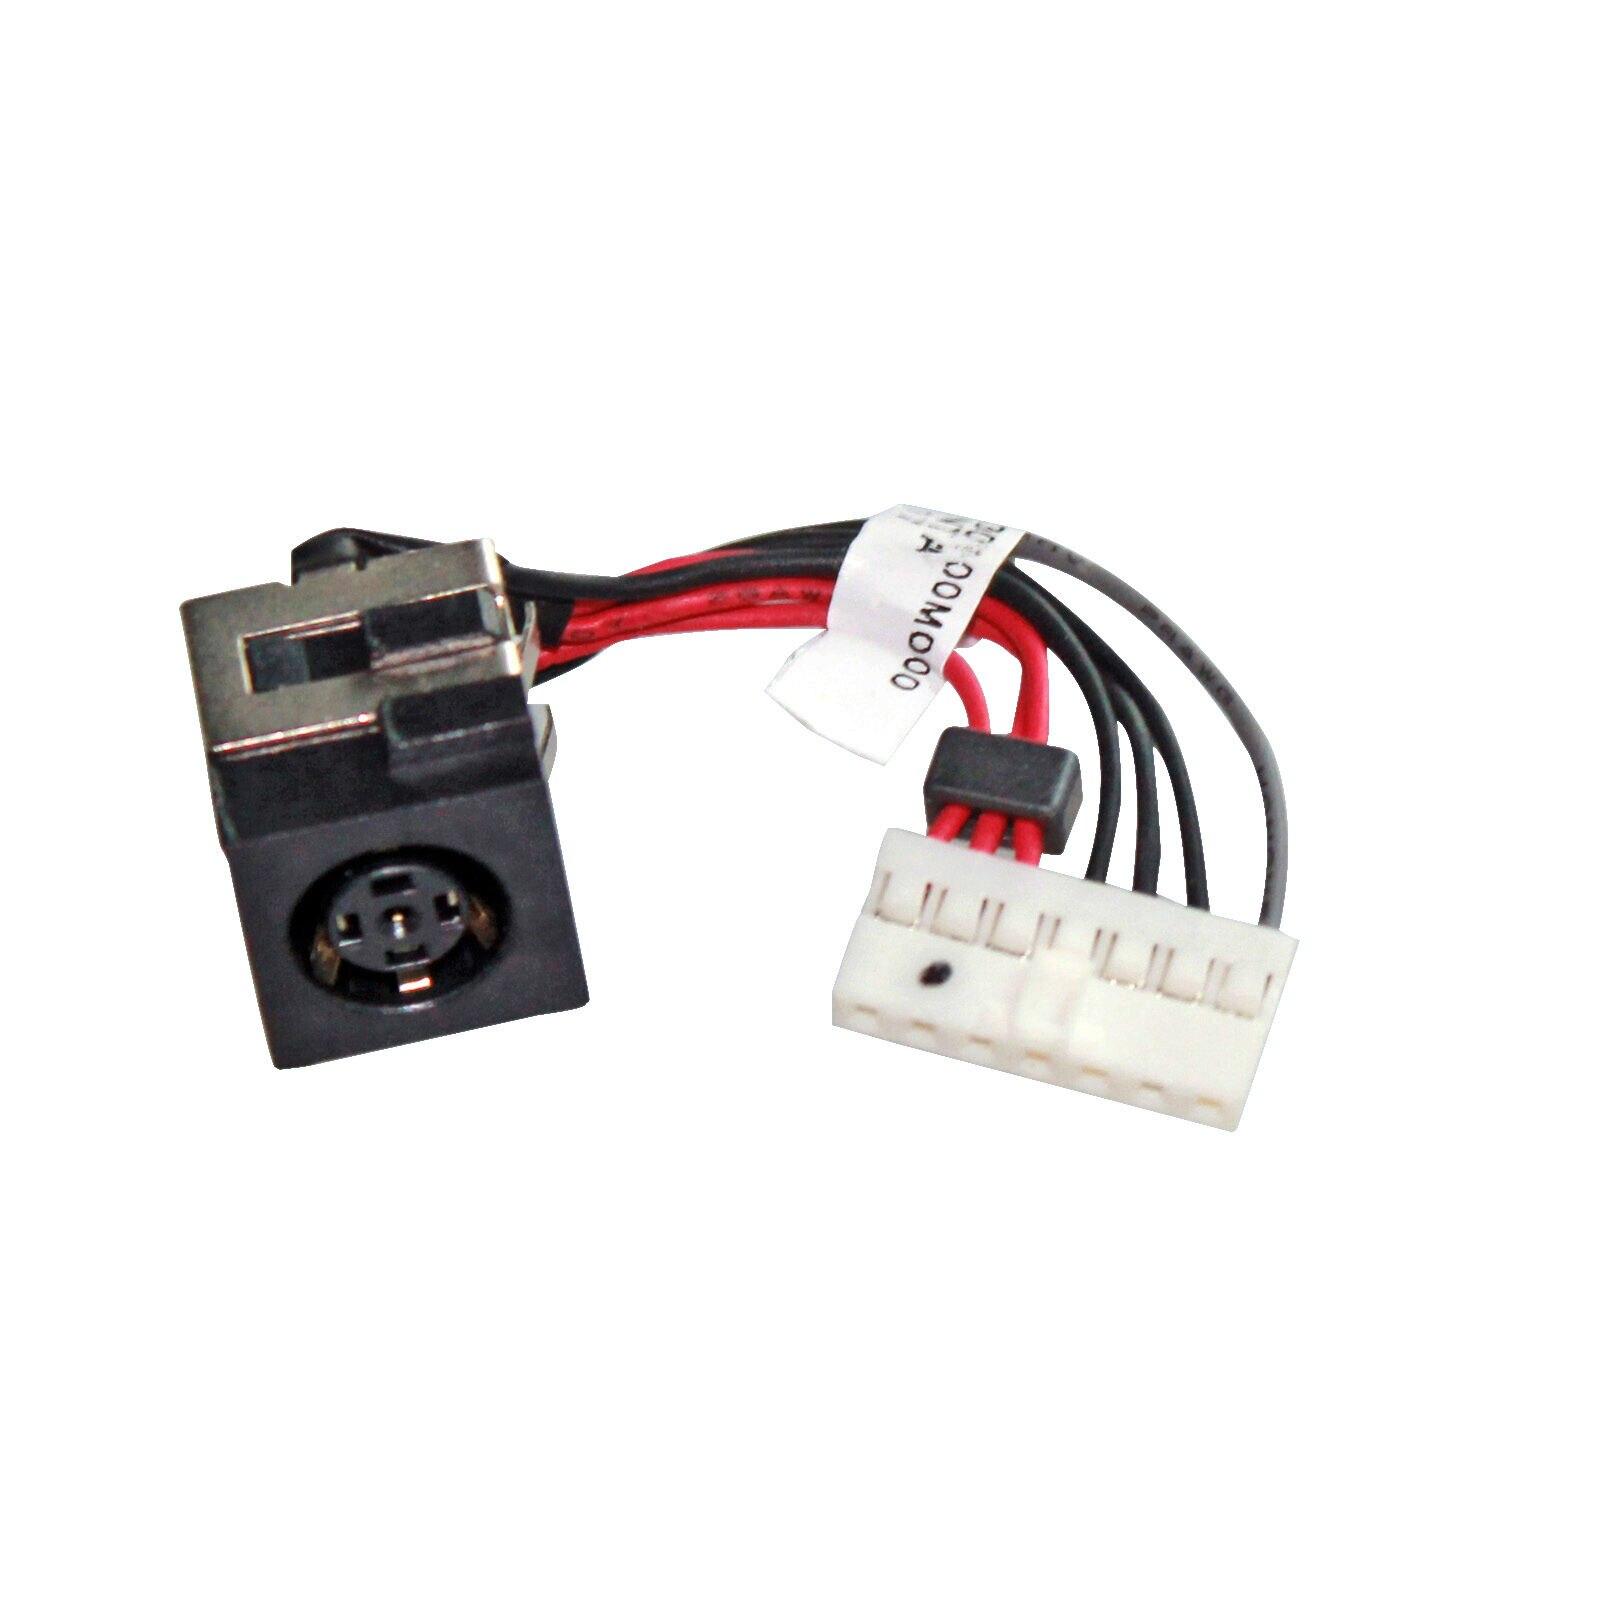 Conector de toma de corriente CC para ordenador portátil con CABLE para...